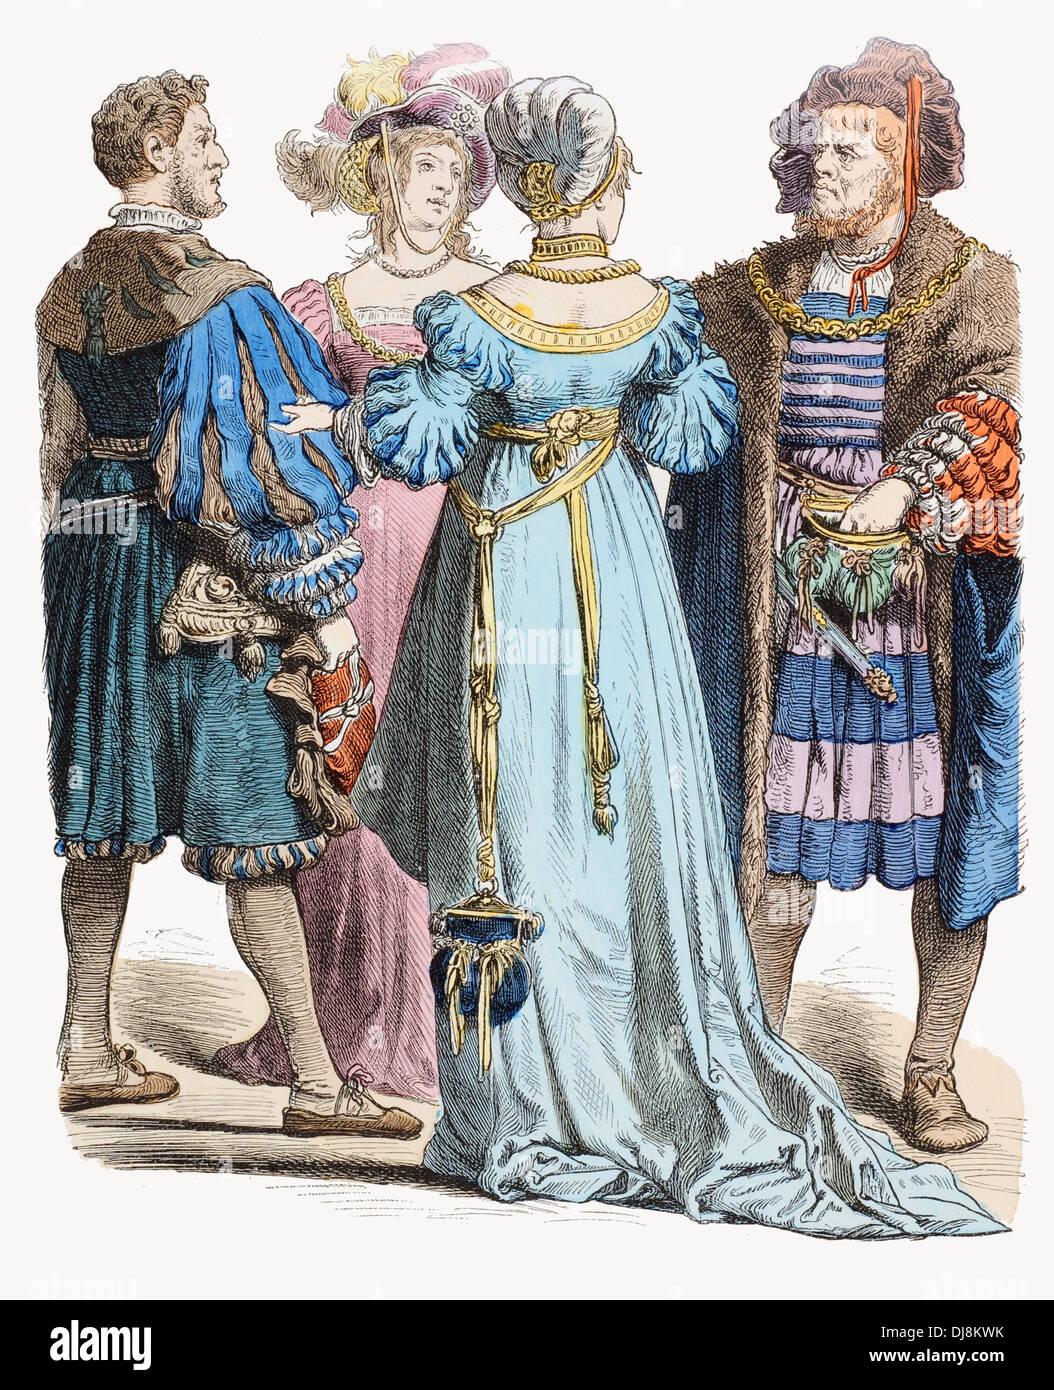 16th Century XVI  German citizens dress - Stock Image